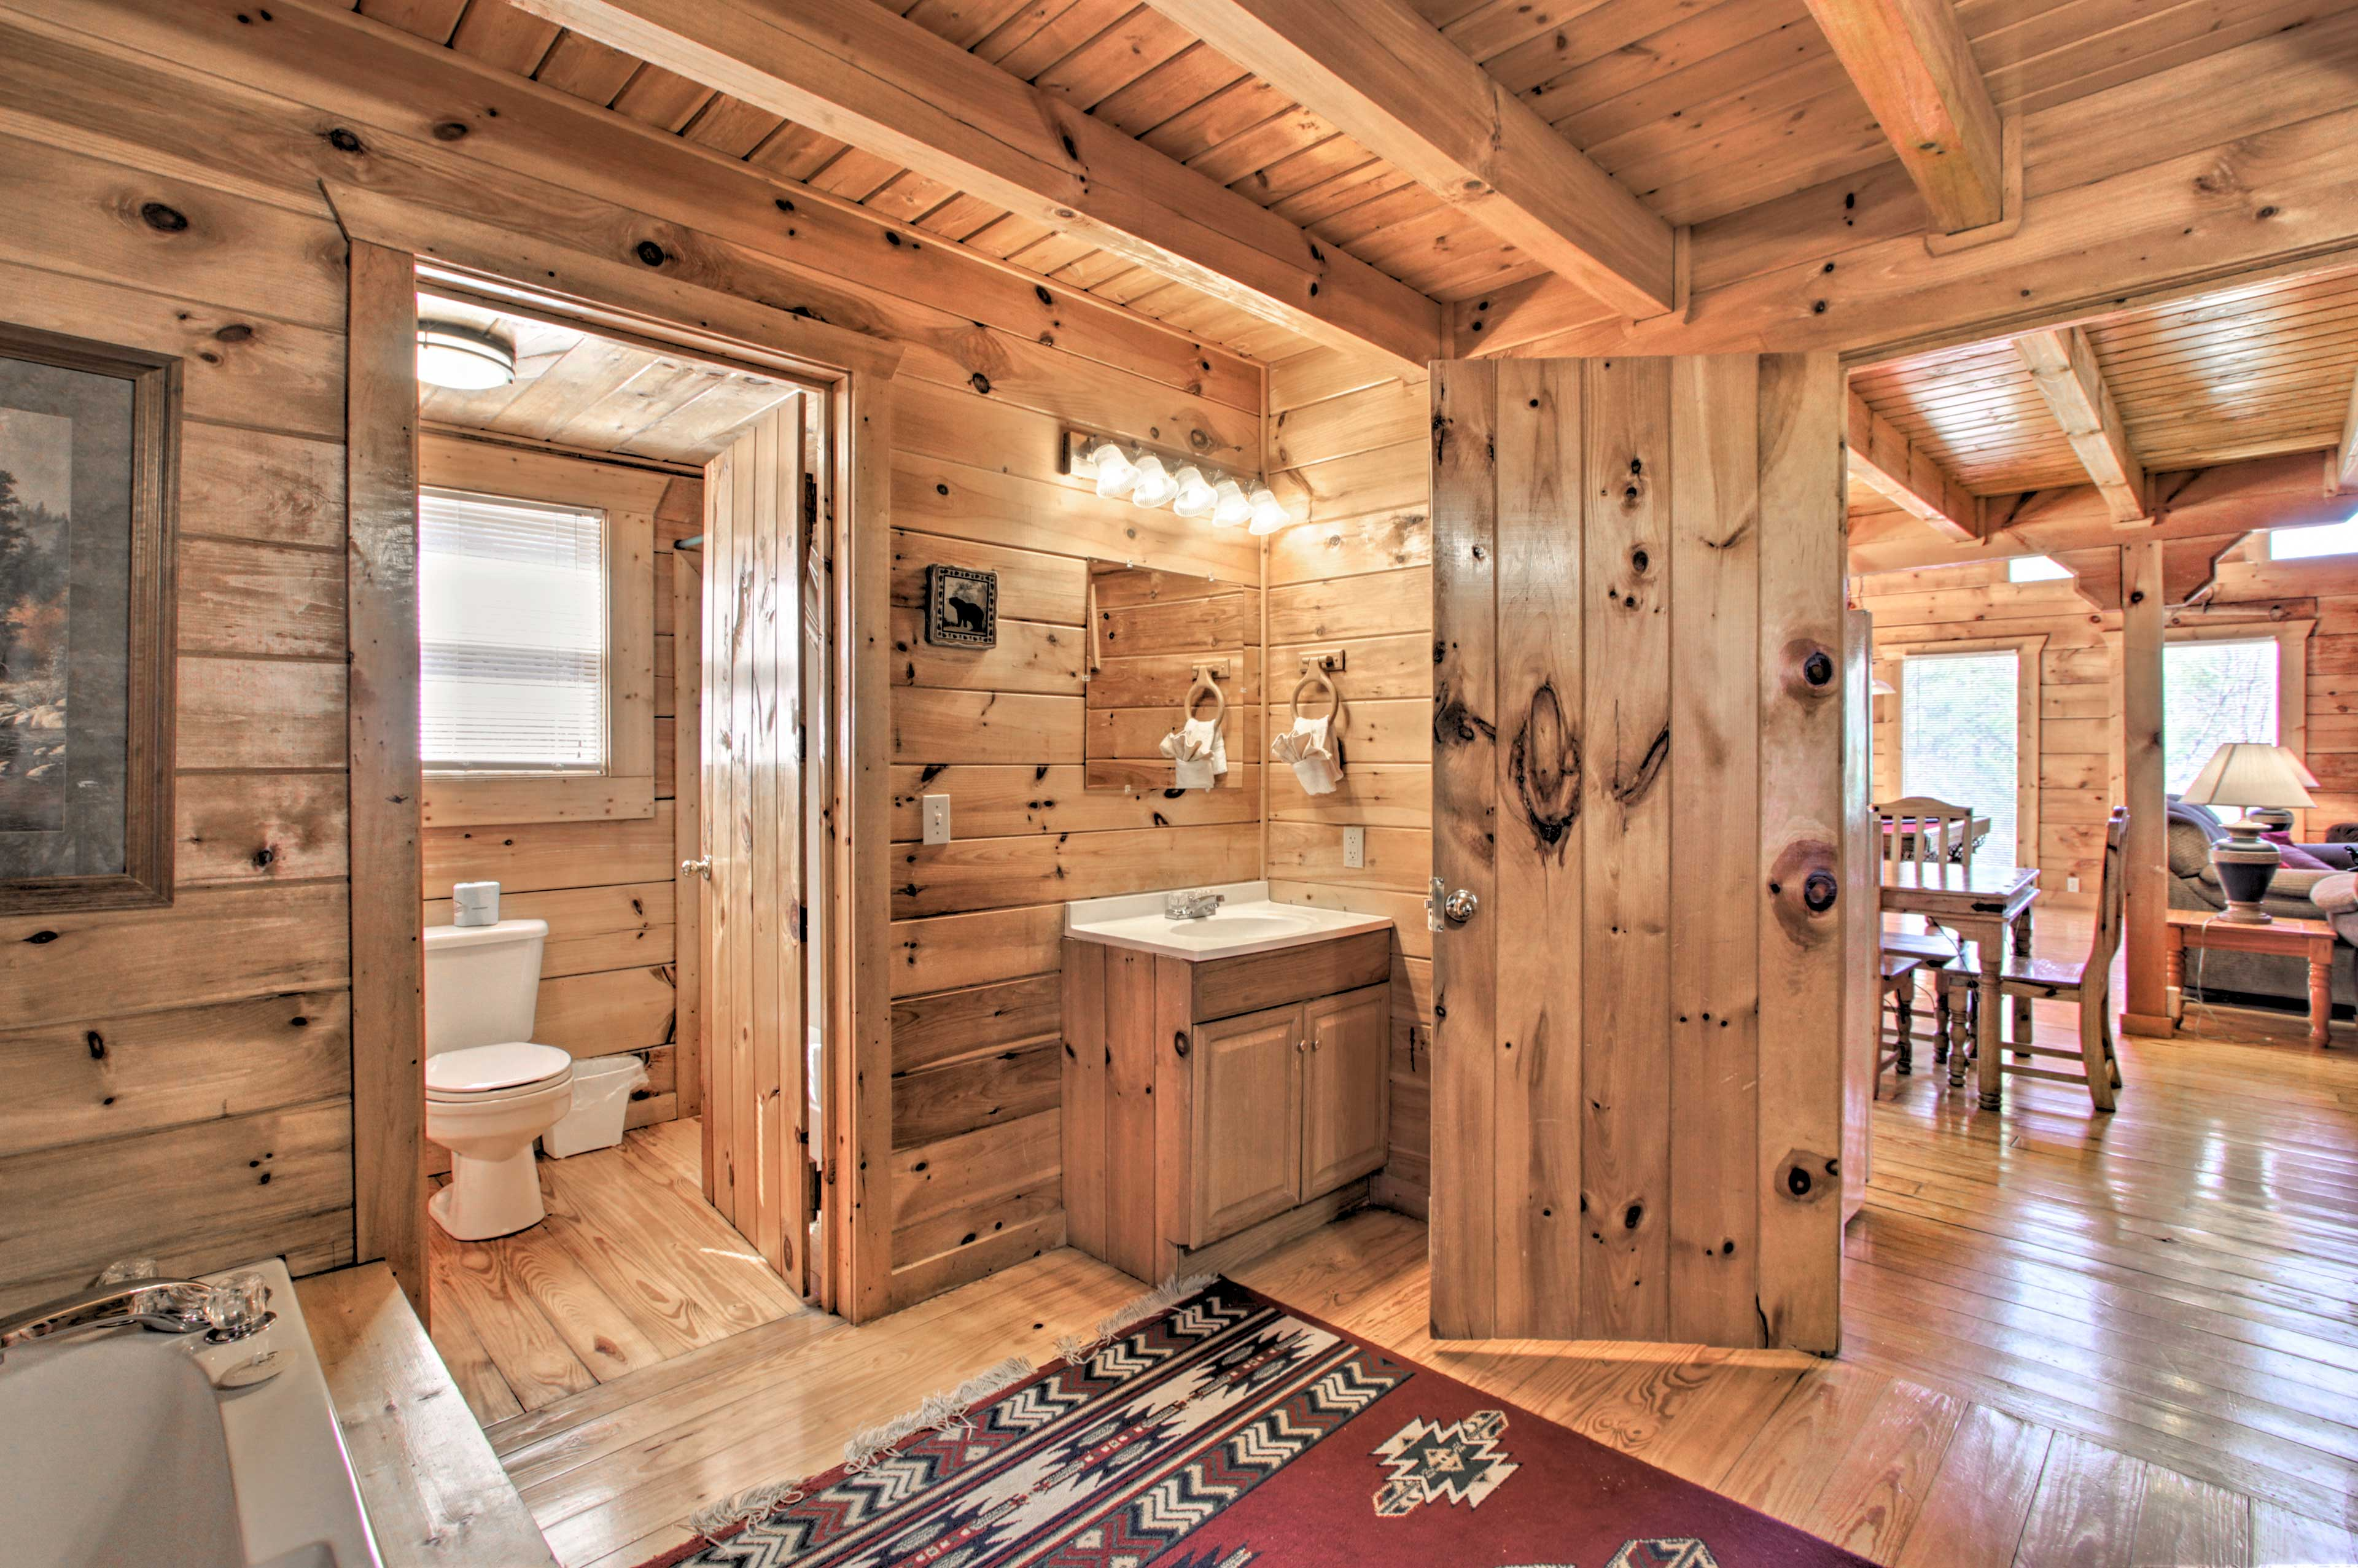 En-Suite Bathroom | Shower/Tub Combo | Washer/Dryer